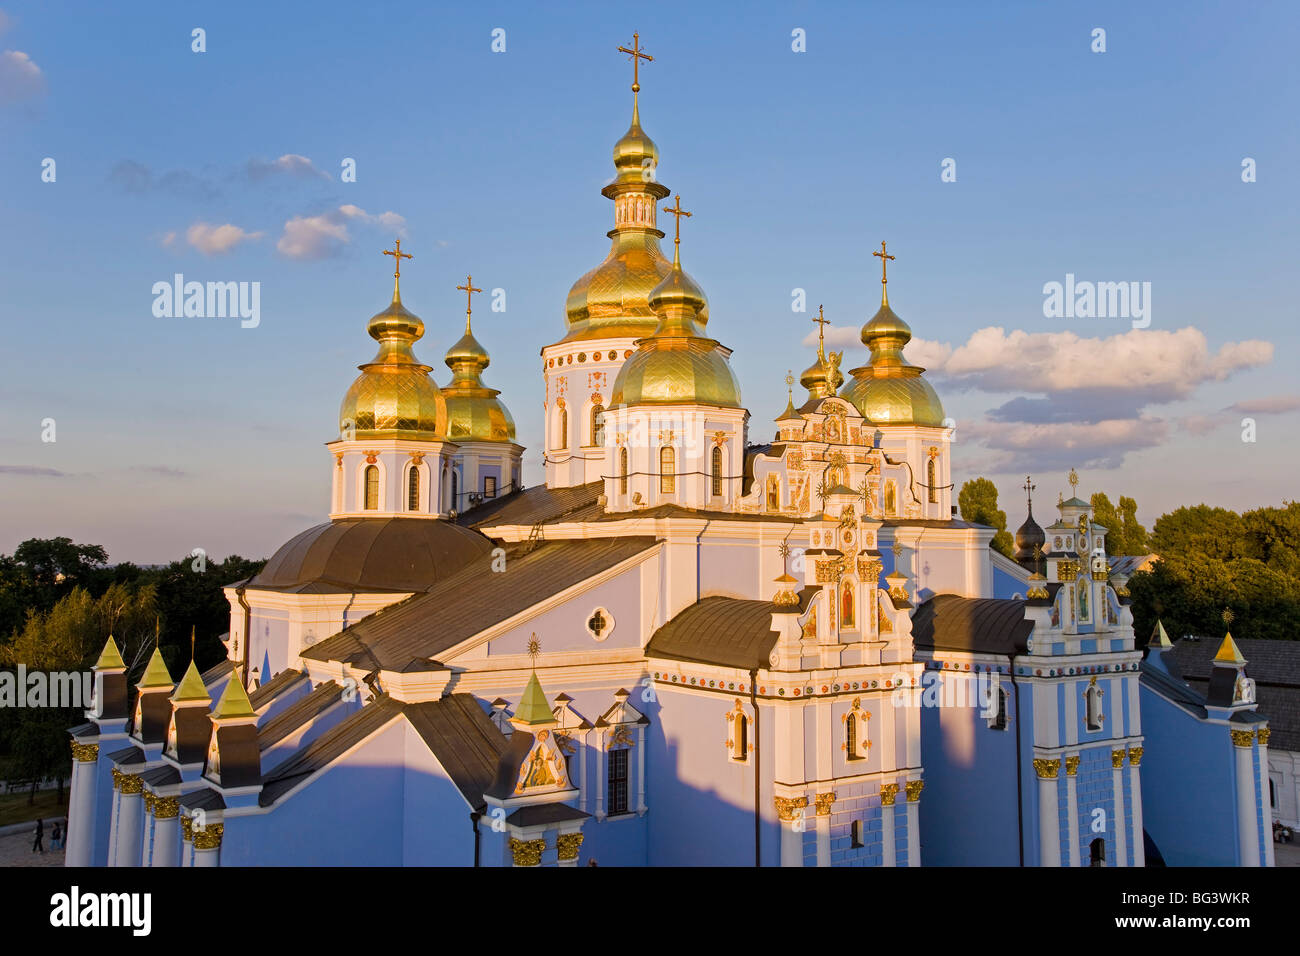 Monasterio de San Miguel, Kiev, Ucrania, Europa Imagen De Stock